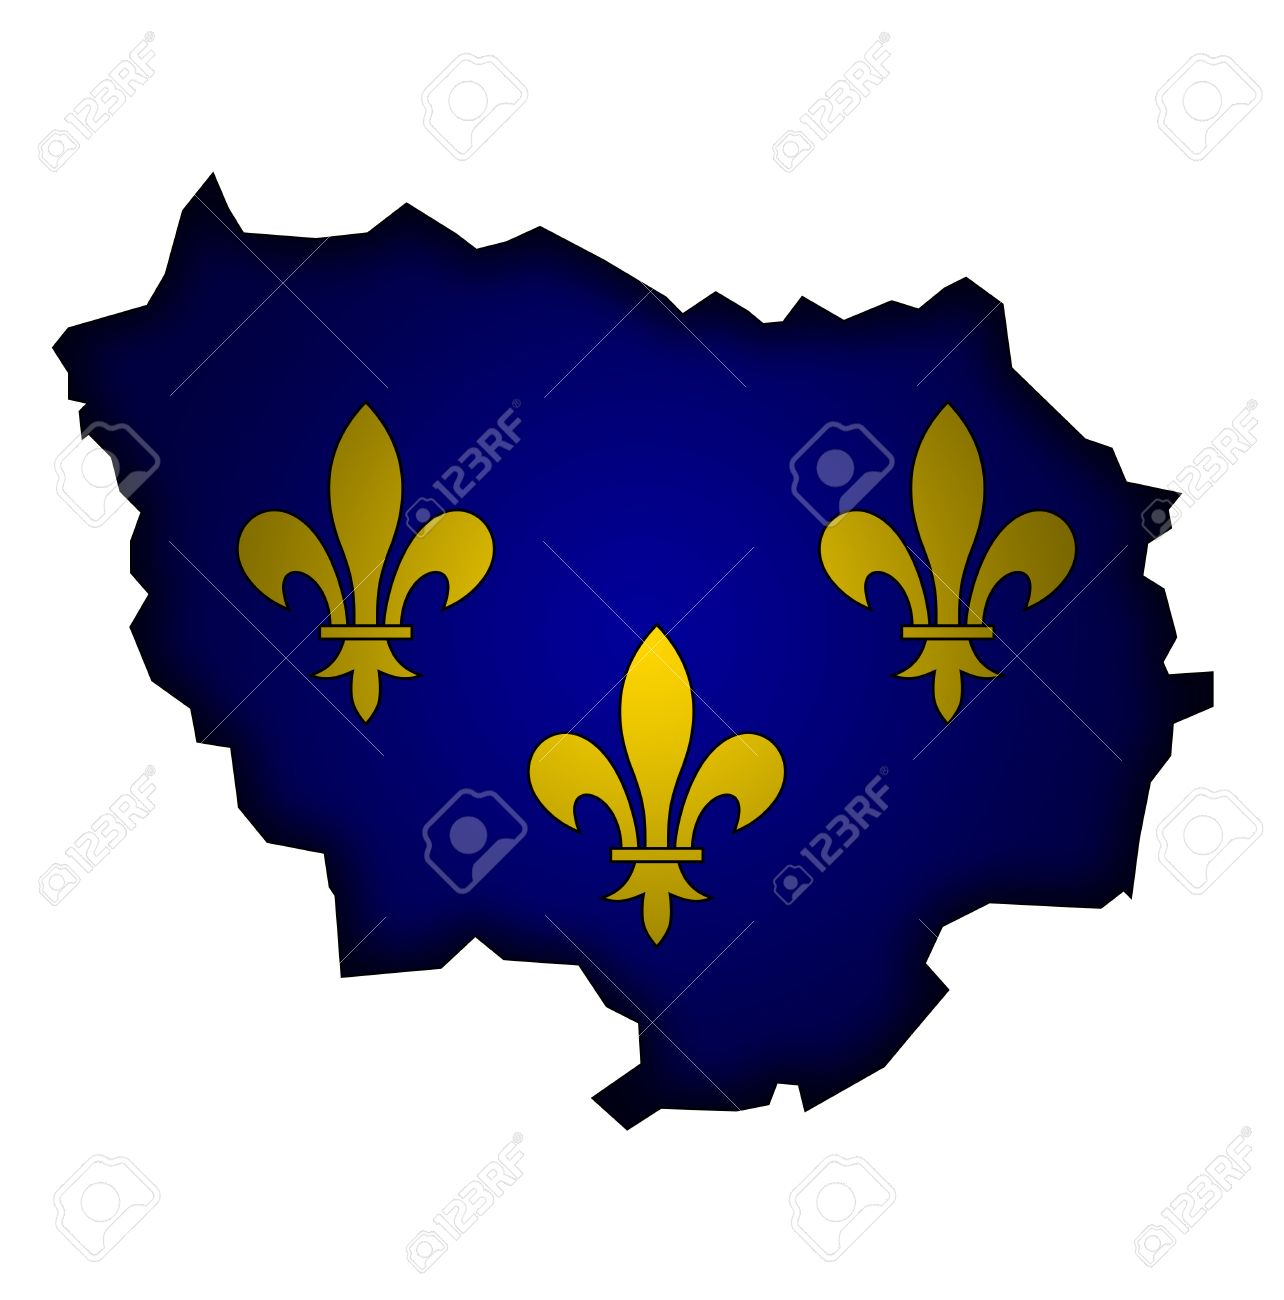 Old Map With Flag Of Department, Administrative Region Of France.. dedans Carte France Avec Region